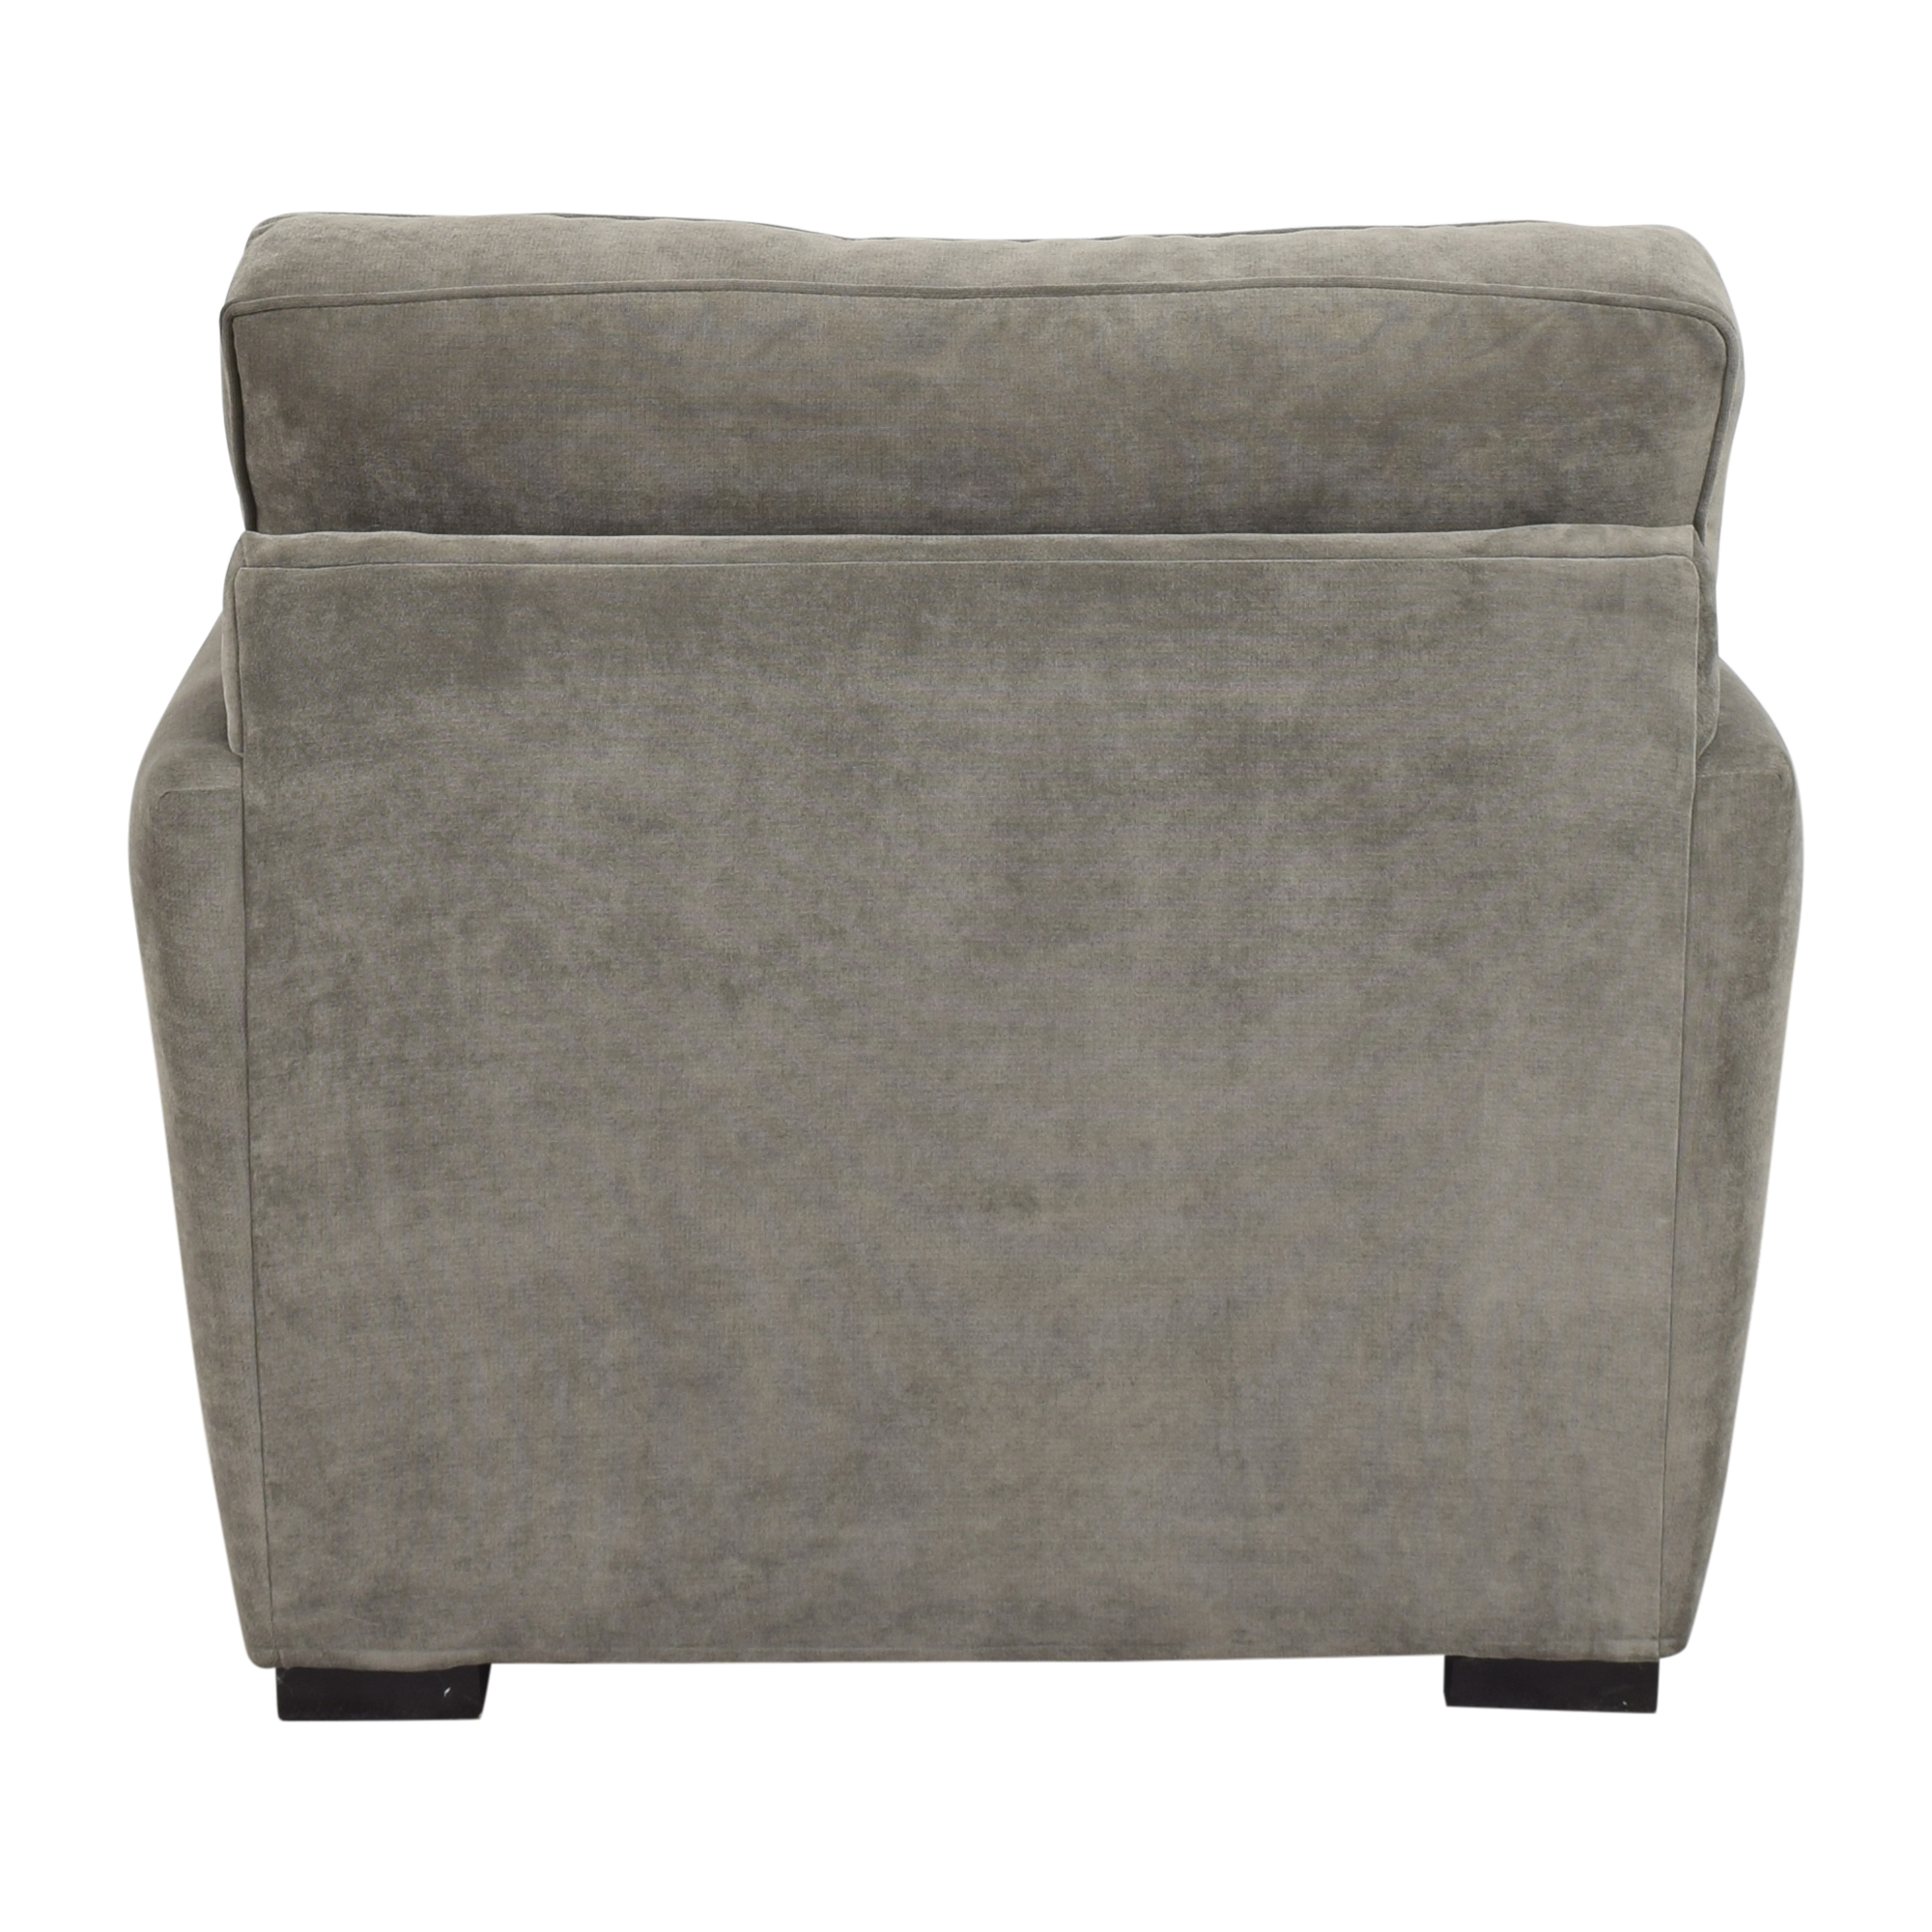 buy Raymour & Flanigan  Artemis II Track Arm Chair Raymour & Flanigan Sofas